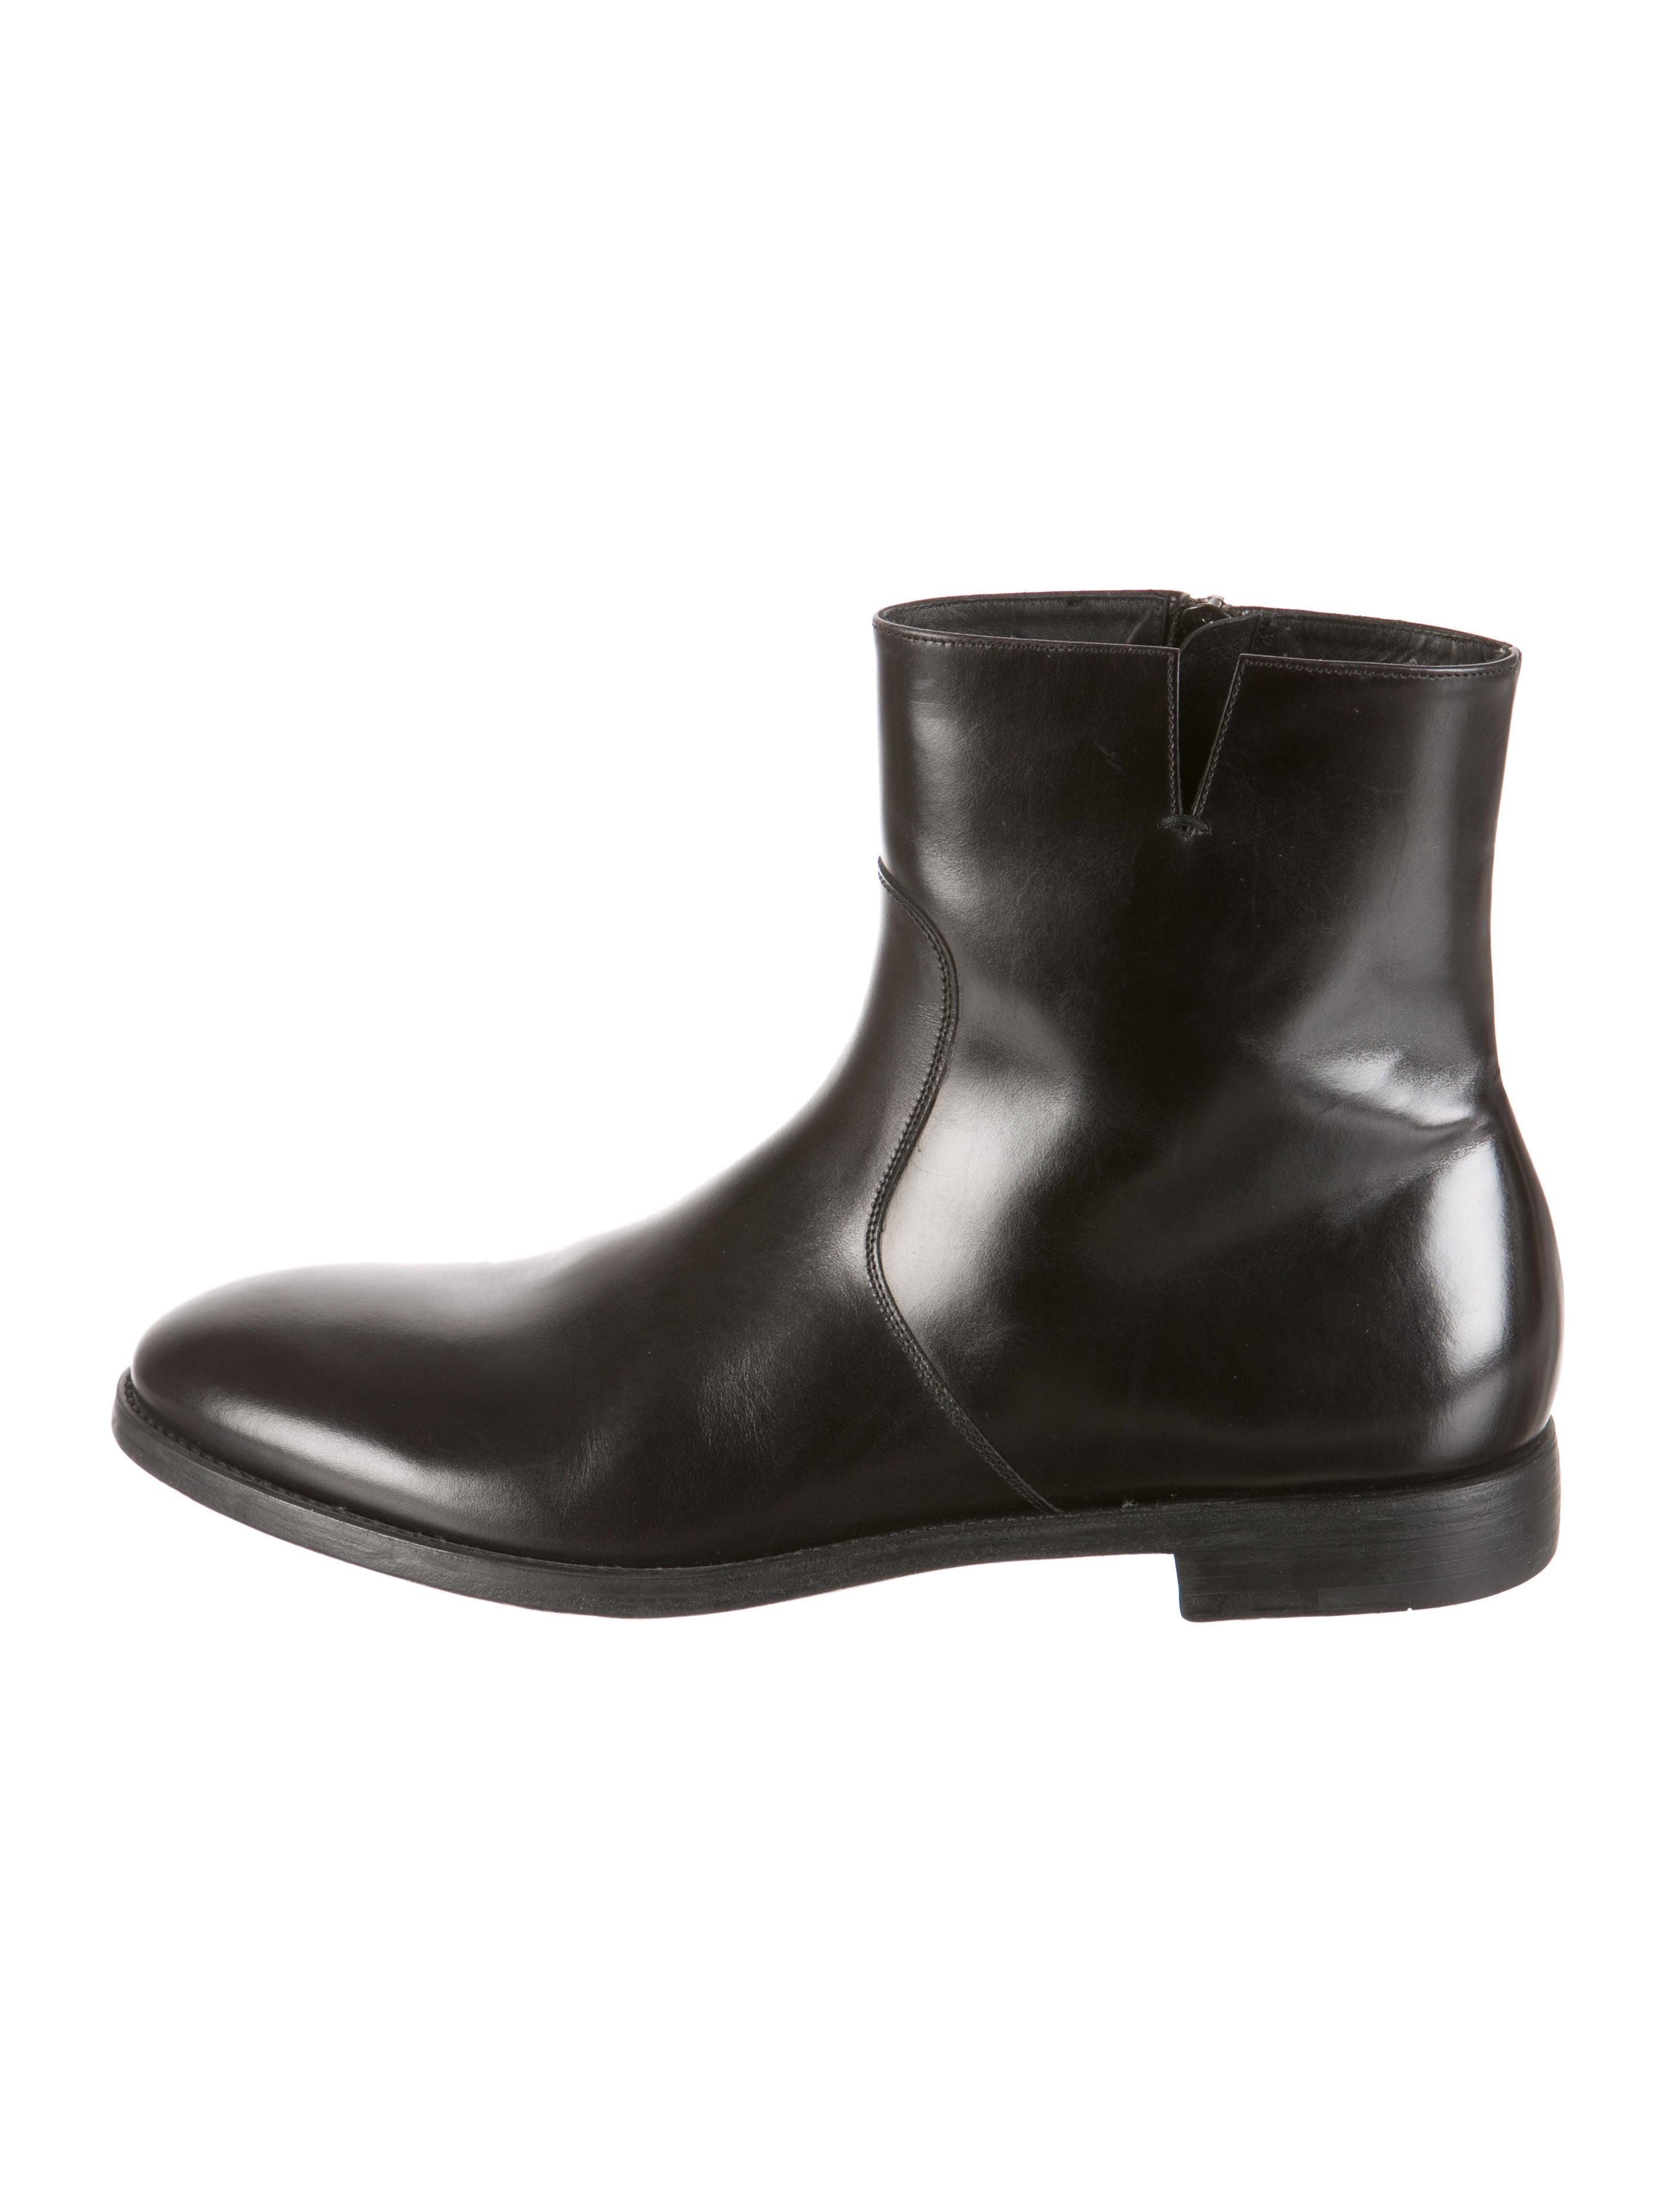 salvatore ferragamo boots shoes sal26017 the realreal